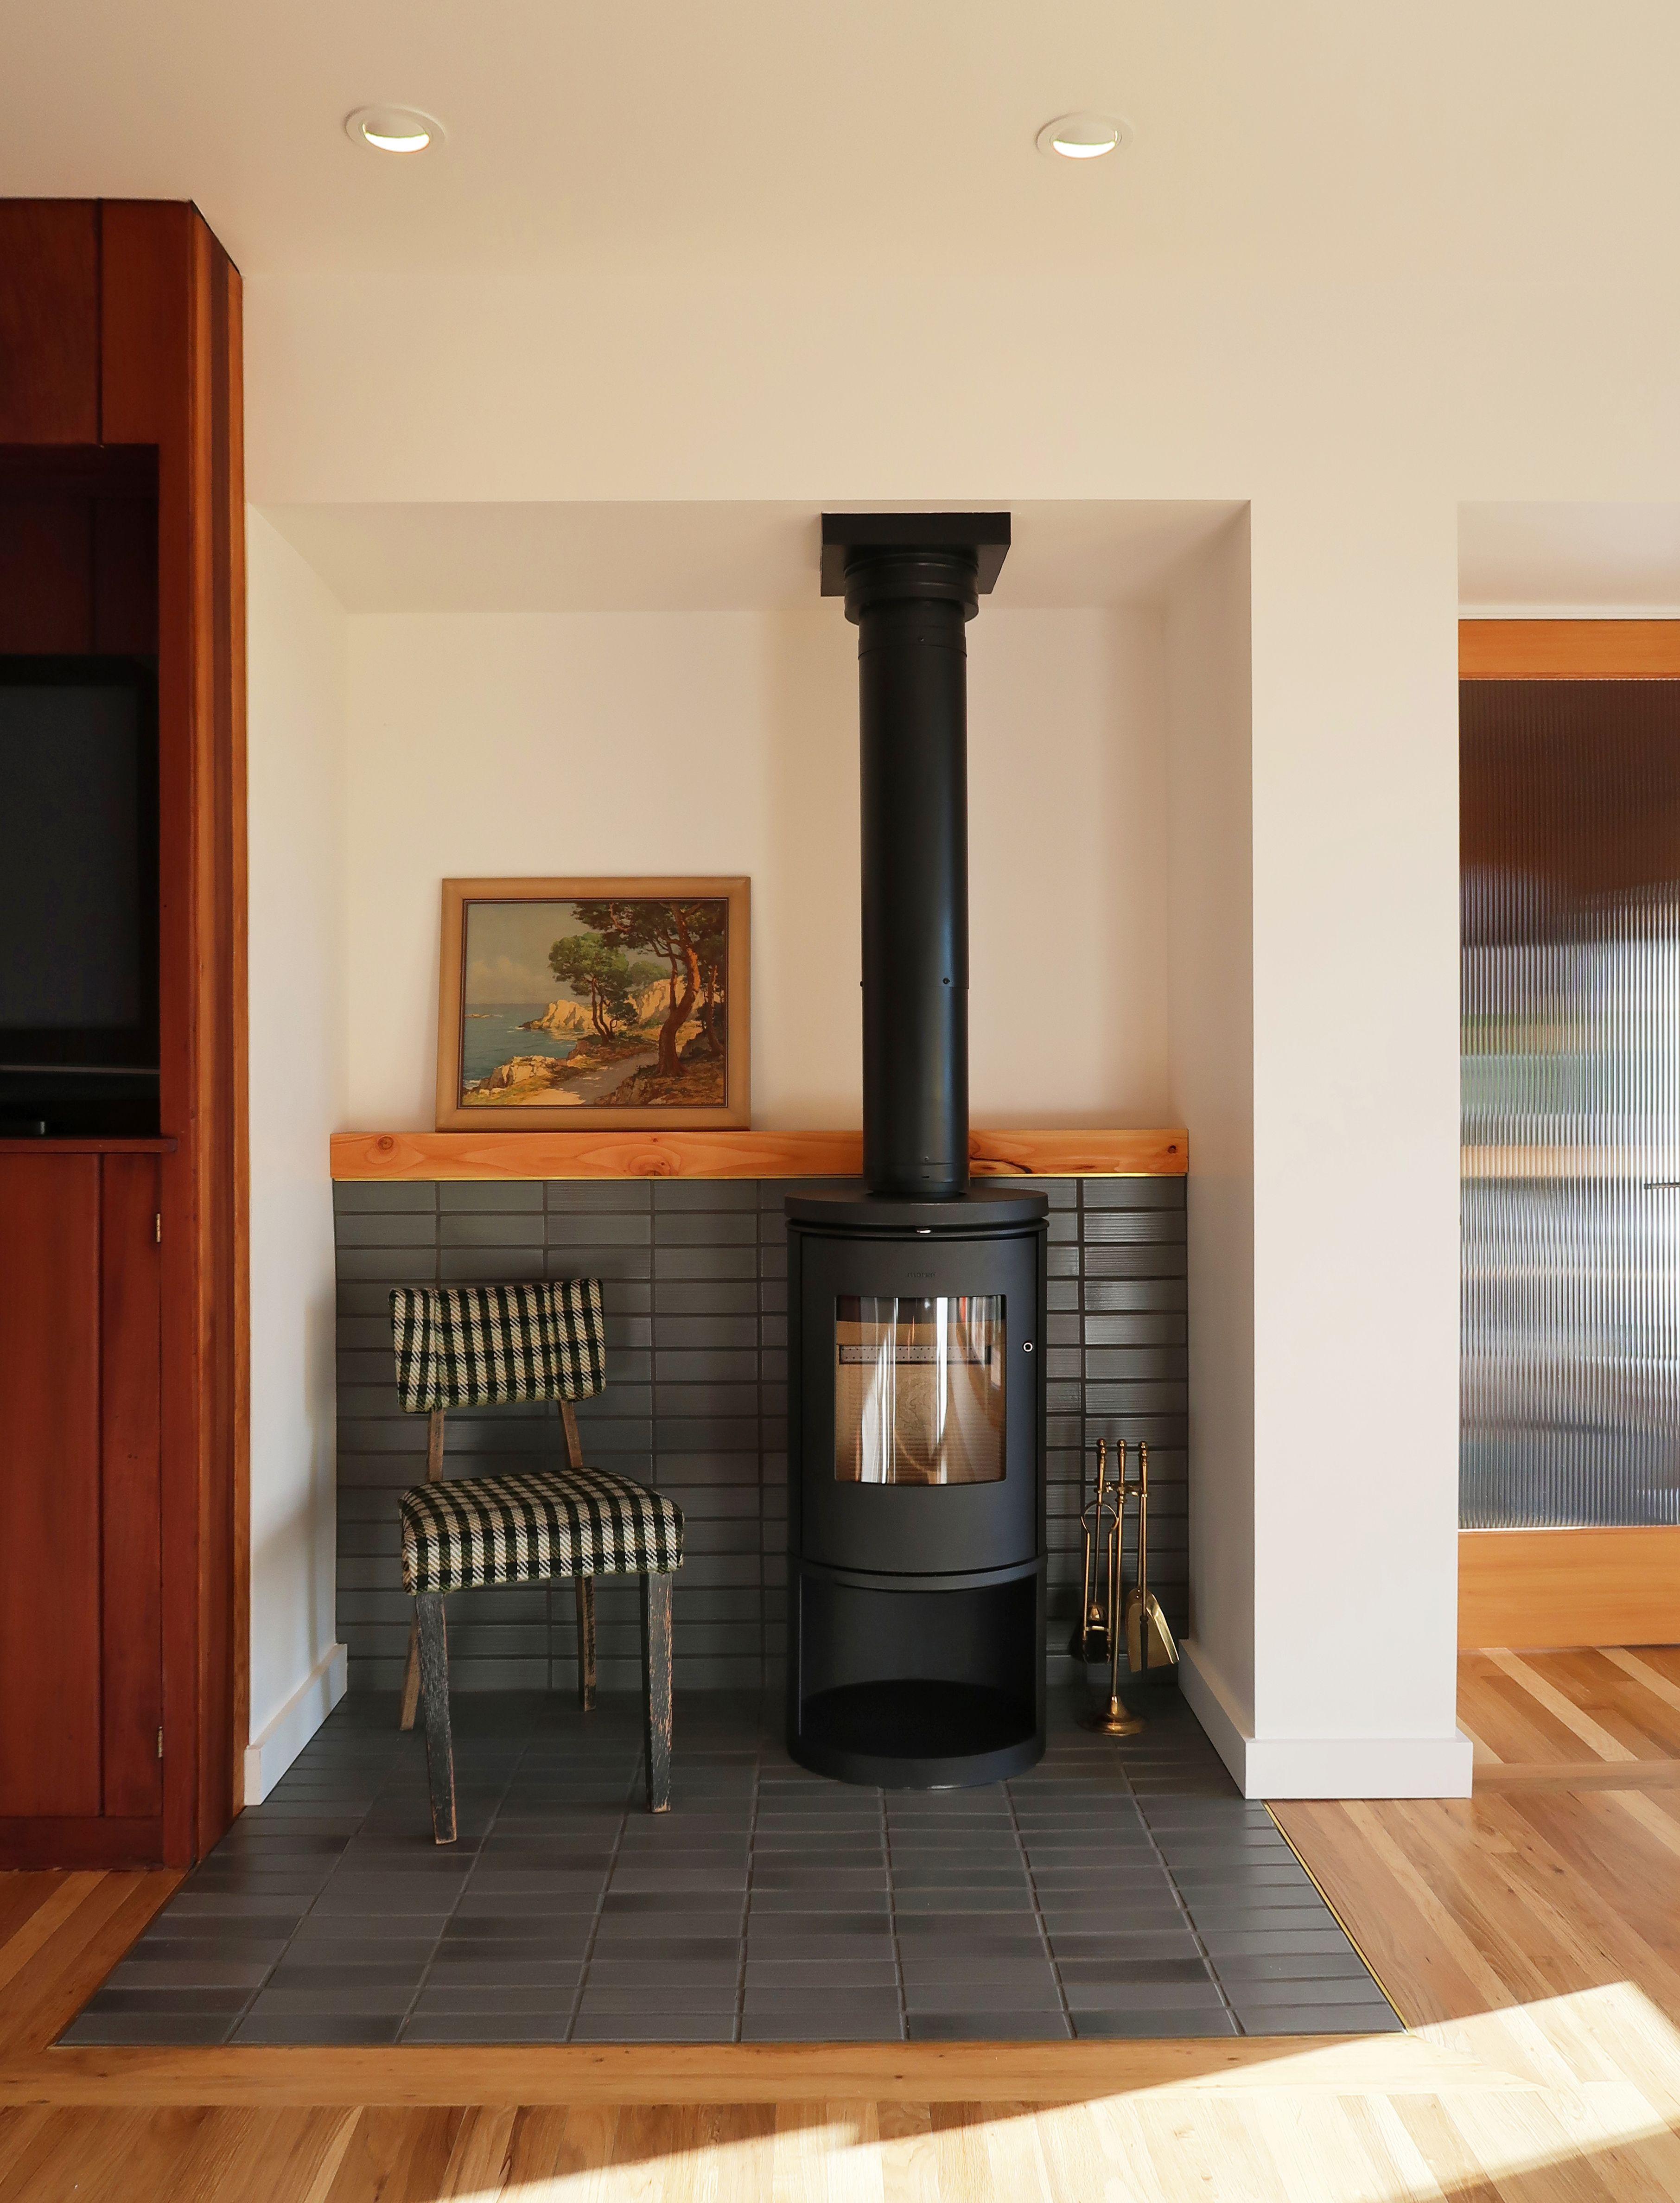 Modern Inglenook Pratt Larson Brownstone Tile Modern Wood Stove Morso Plaid Chair Modern Wood Burning Stoves Wood Burning Stoves Living Room Wood Stove